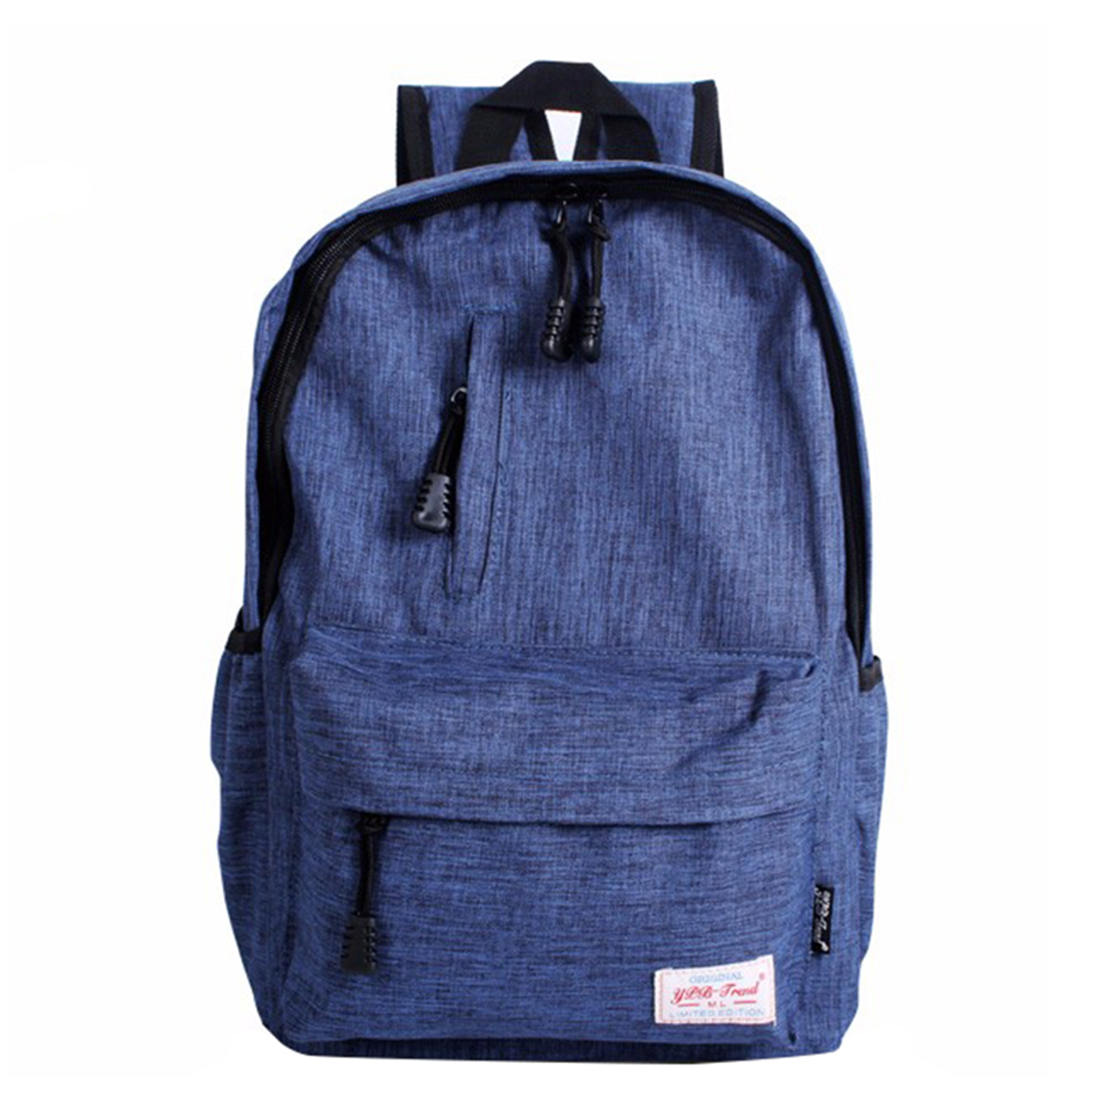 Linen Small Backpack Unisex School Bag For Teenage School Backpack For Students Backpacks Rucksack Bookbags Travel Bag